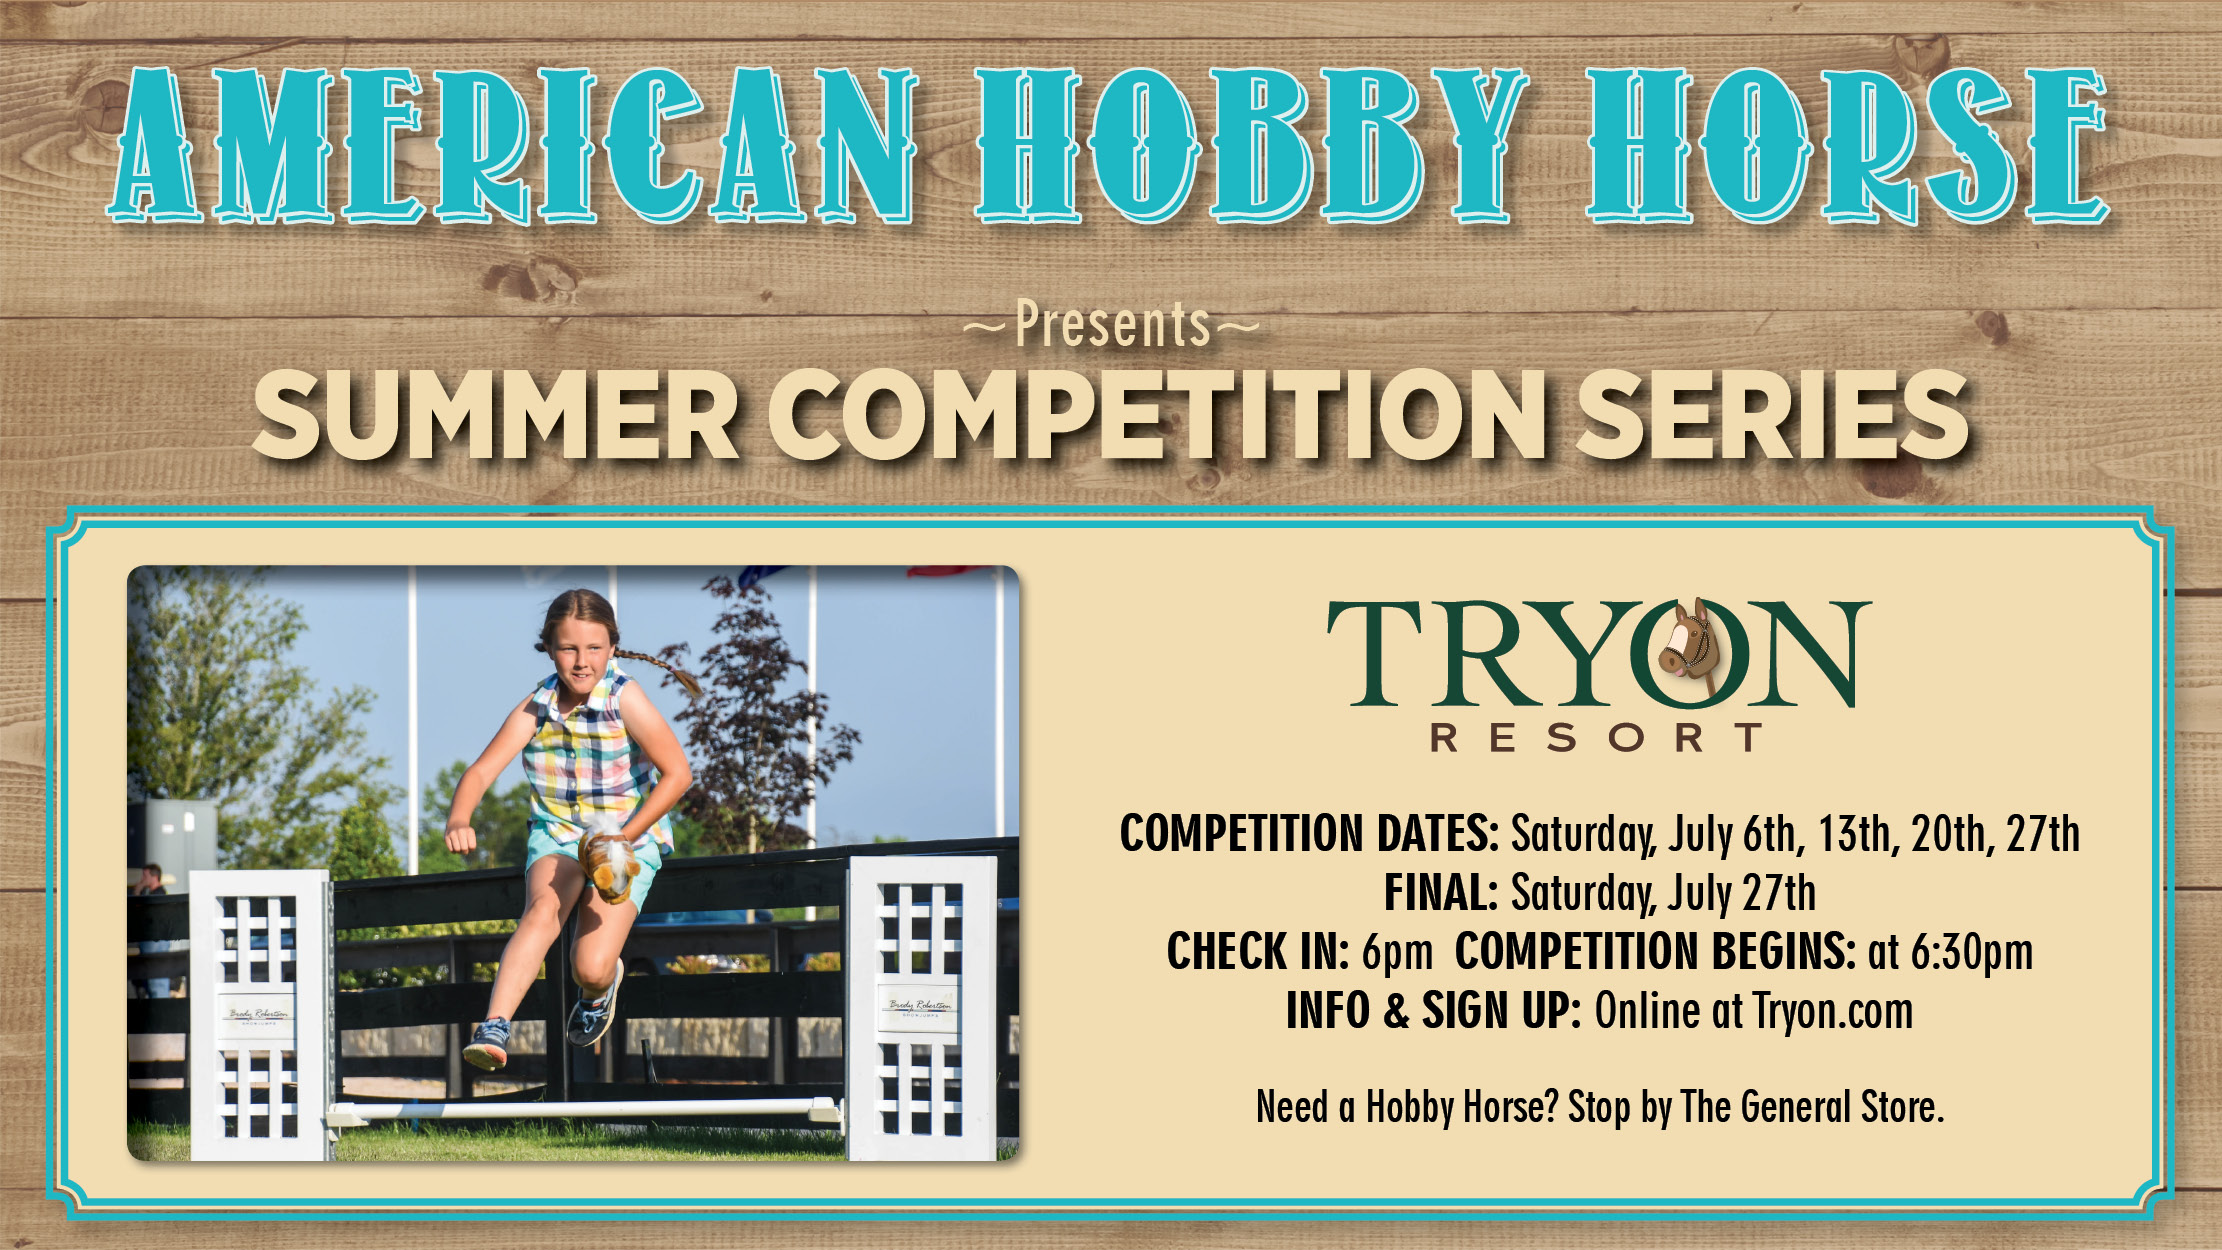 American Hobby Horse_Webslider_Summer